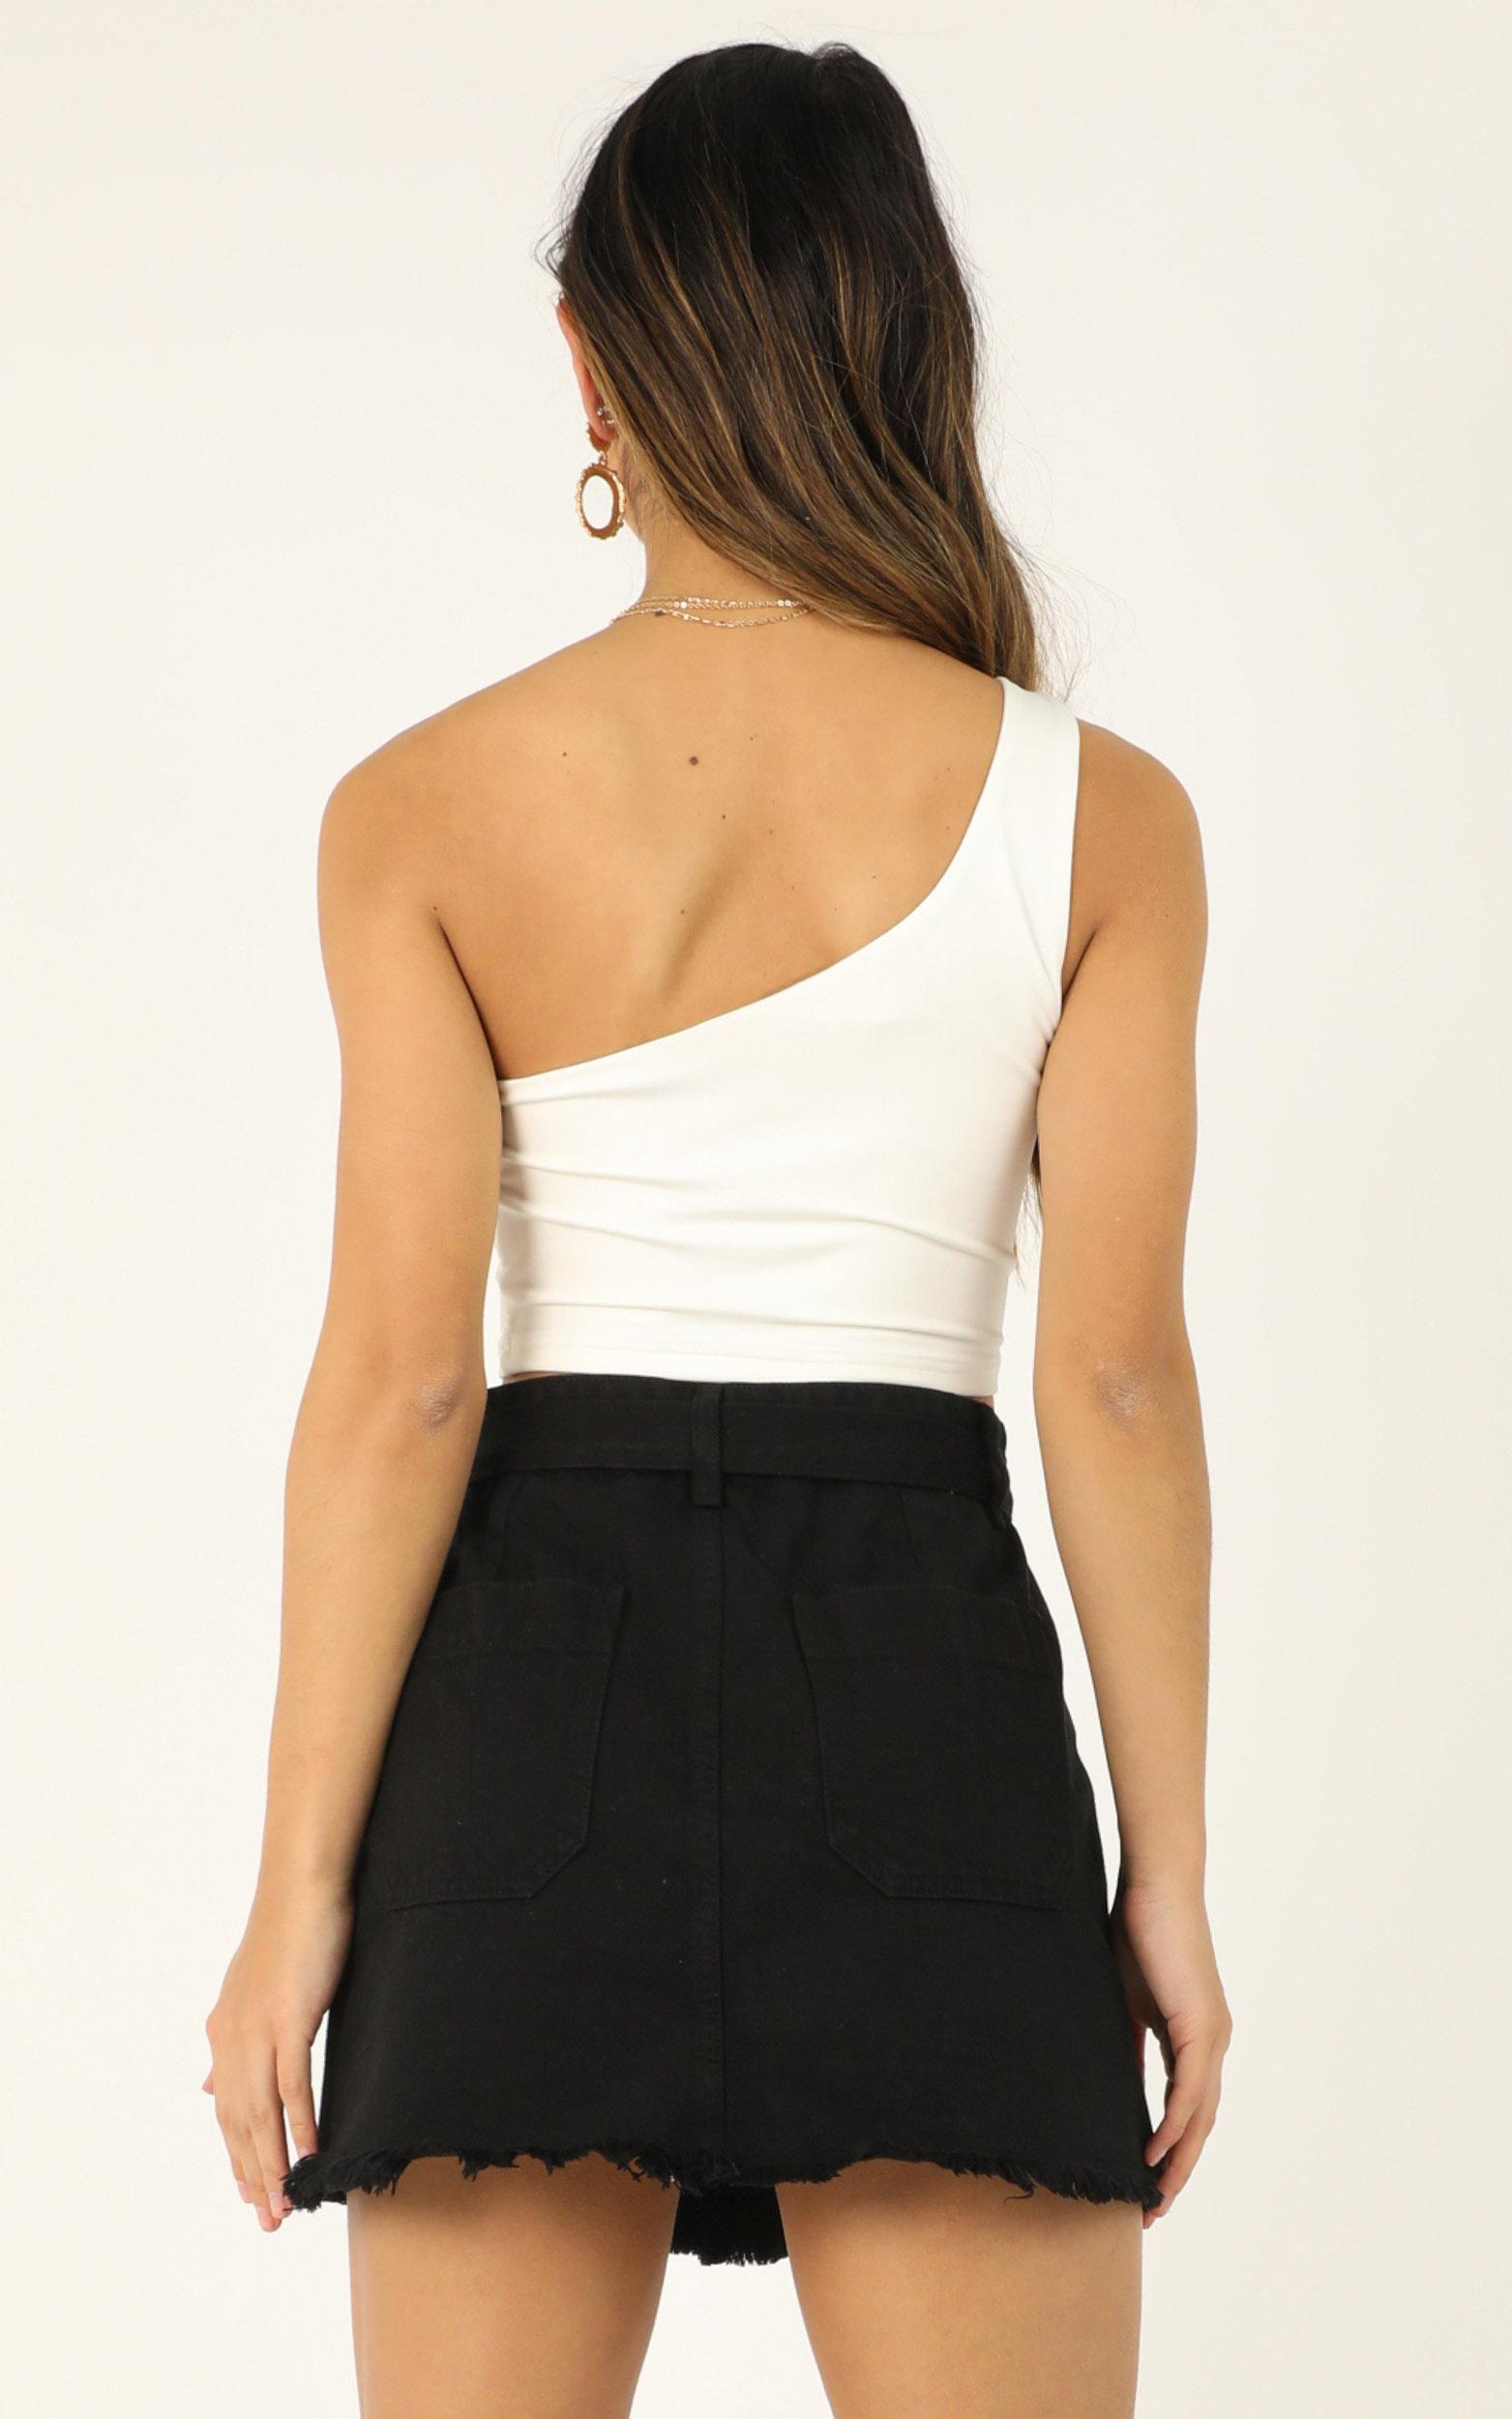 Coming over again denim skirt in black - 12 (L), Black, hi-res image number null